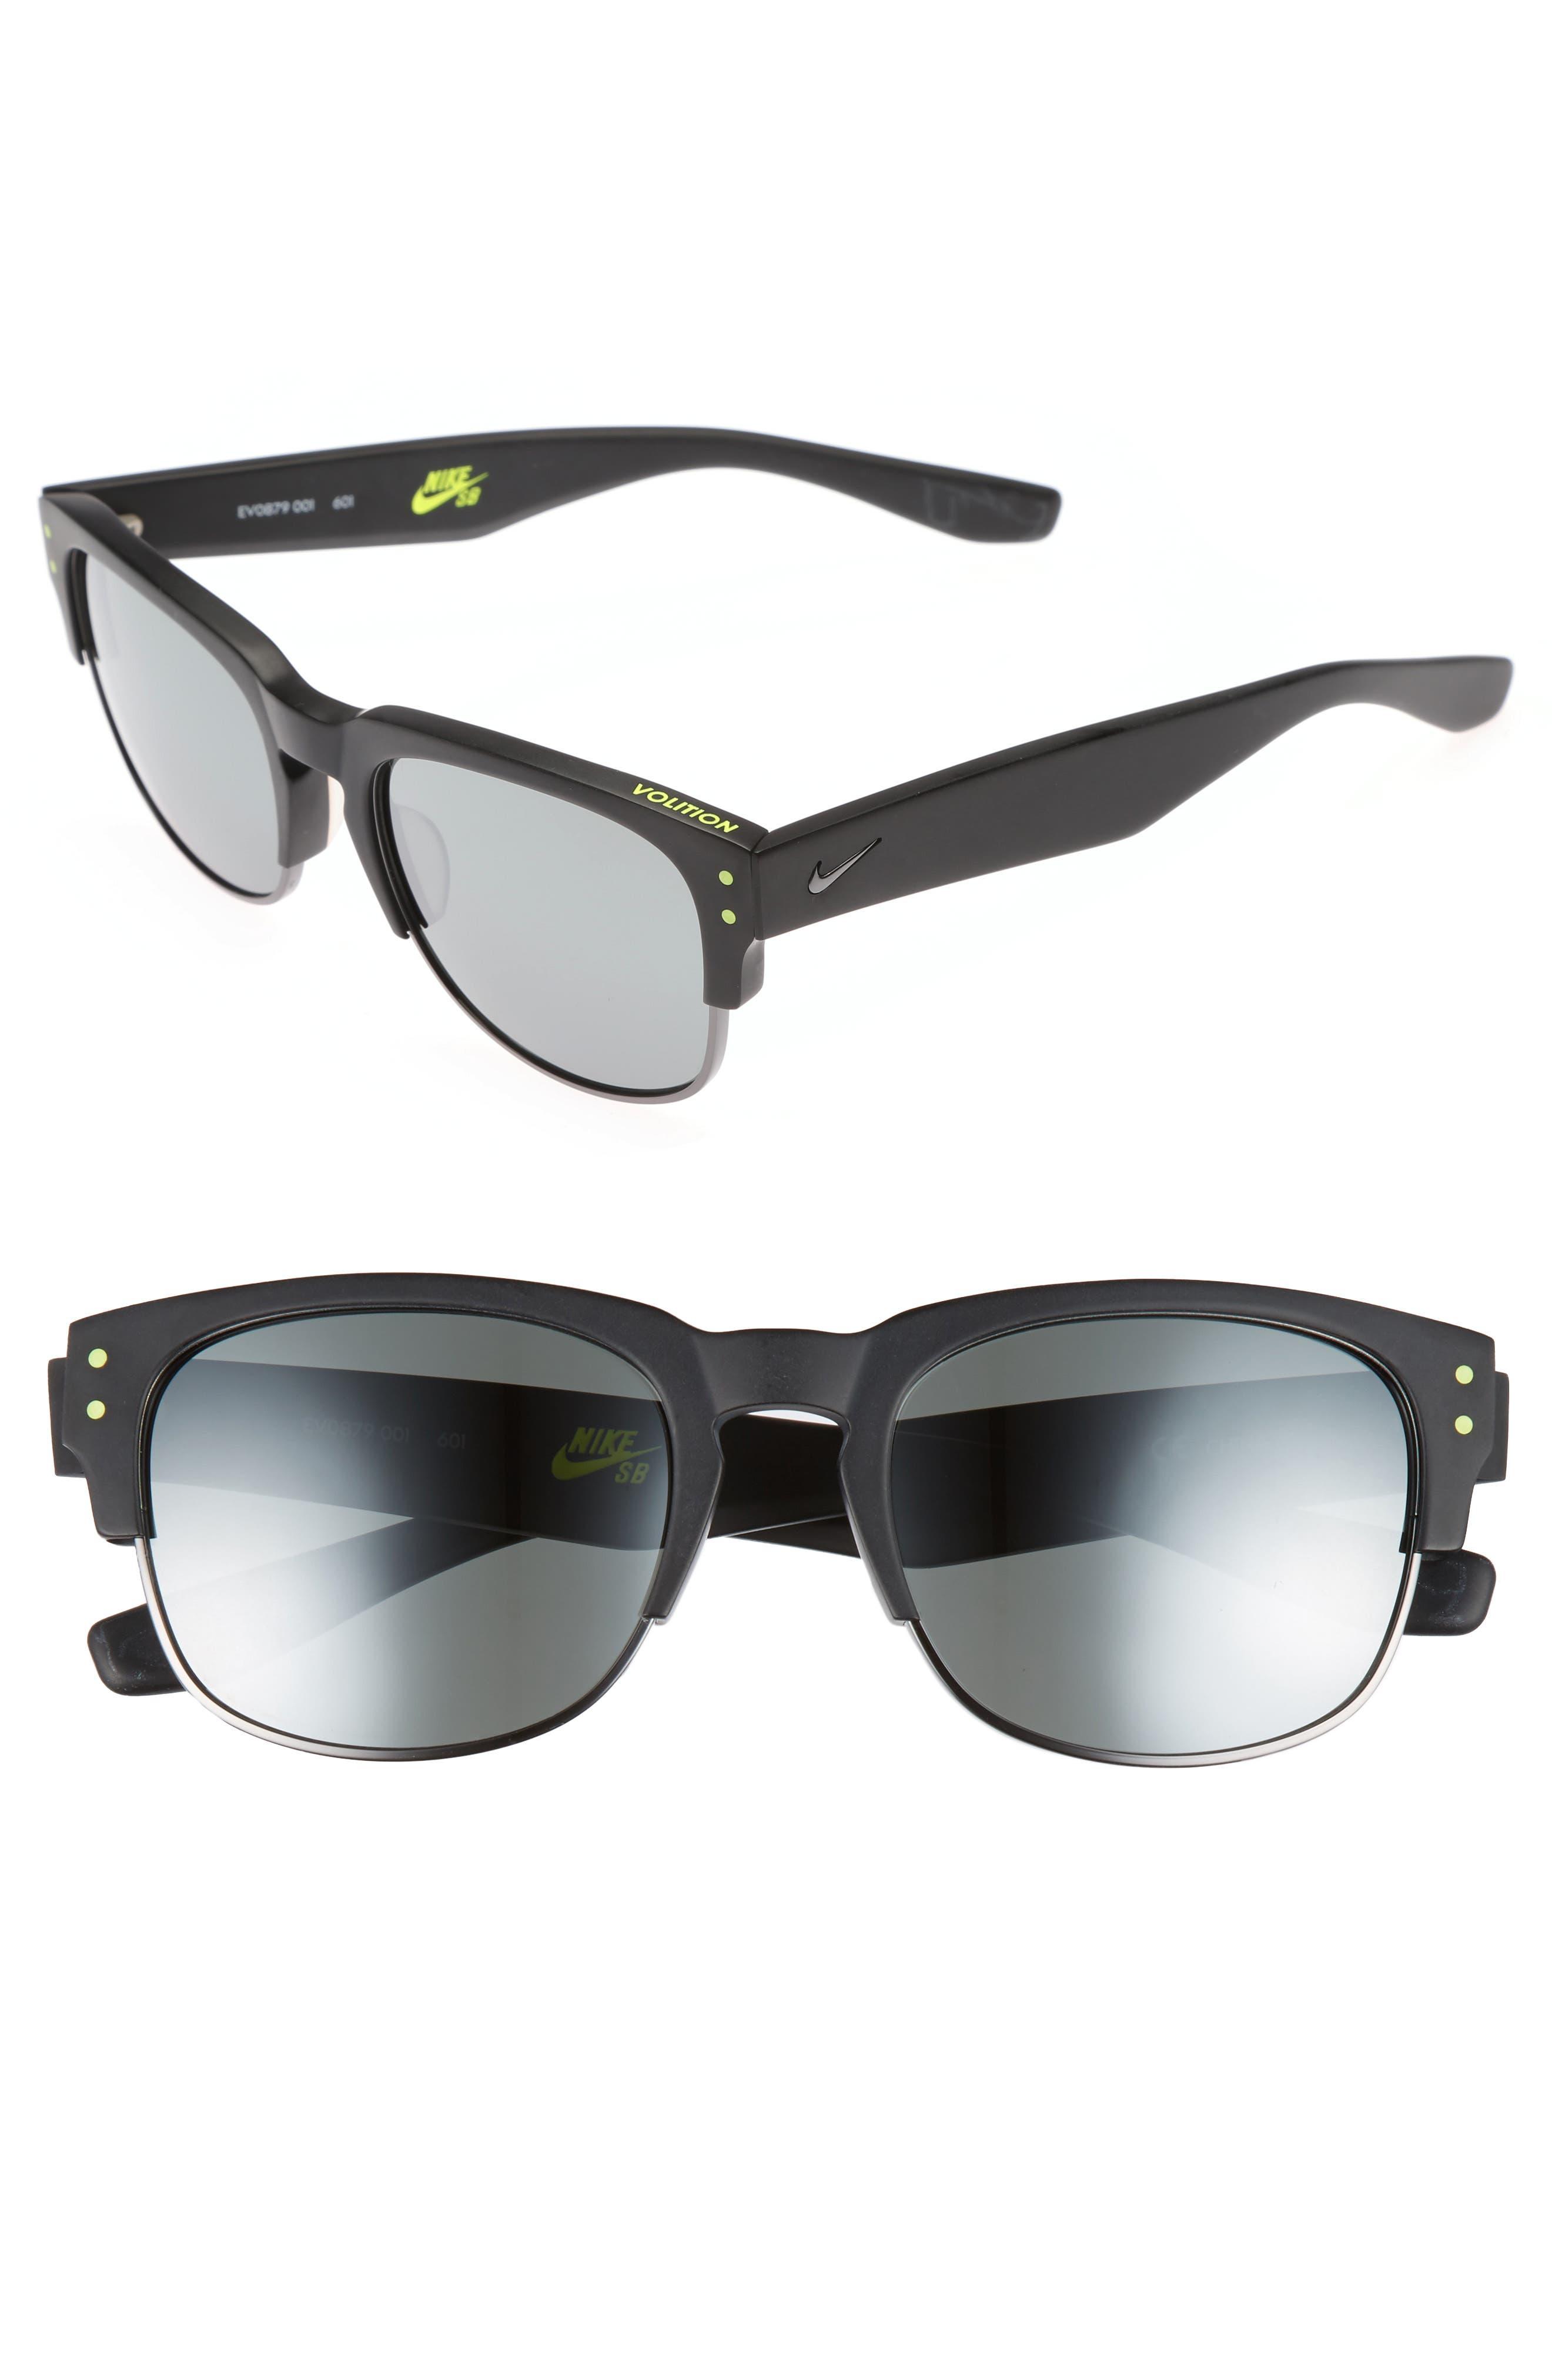 Volition 54mm Sunglasses,                         Main,                         color, Matte Black/ Gunmetal